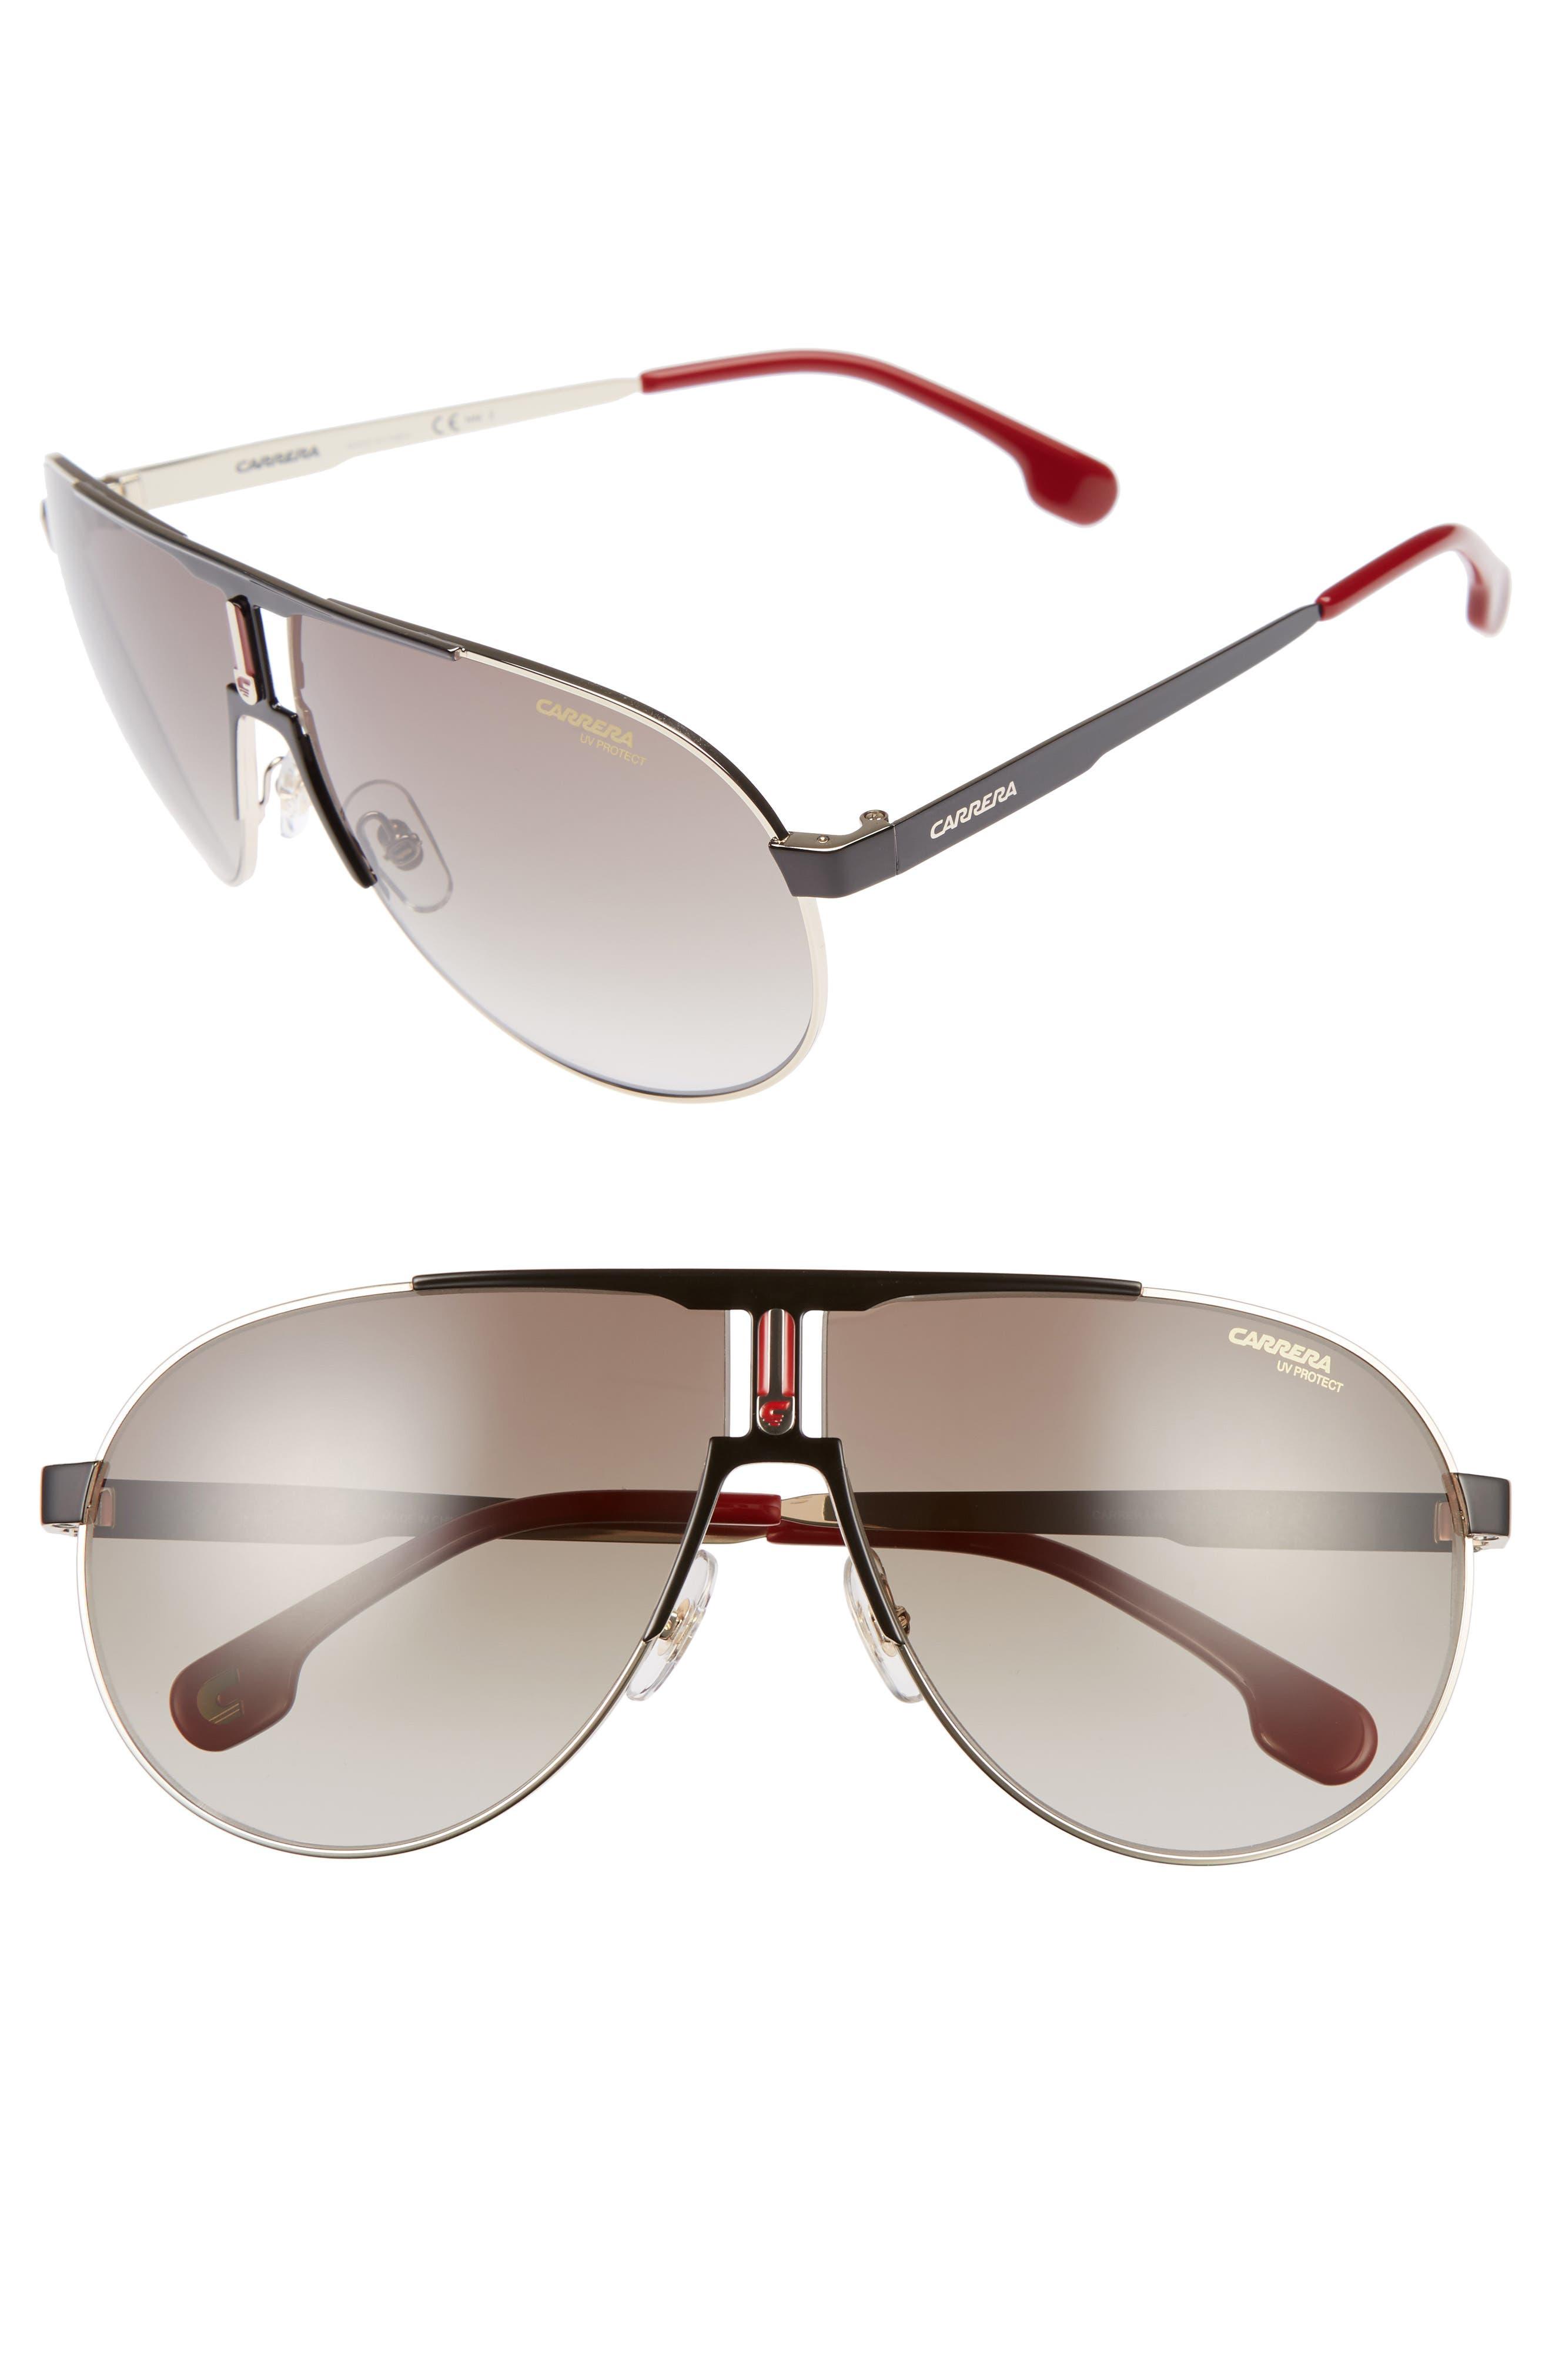 66mm Aviator Sunglasses,                         Main,                         color, 001